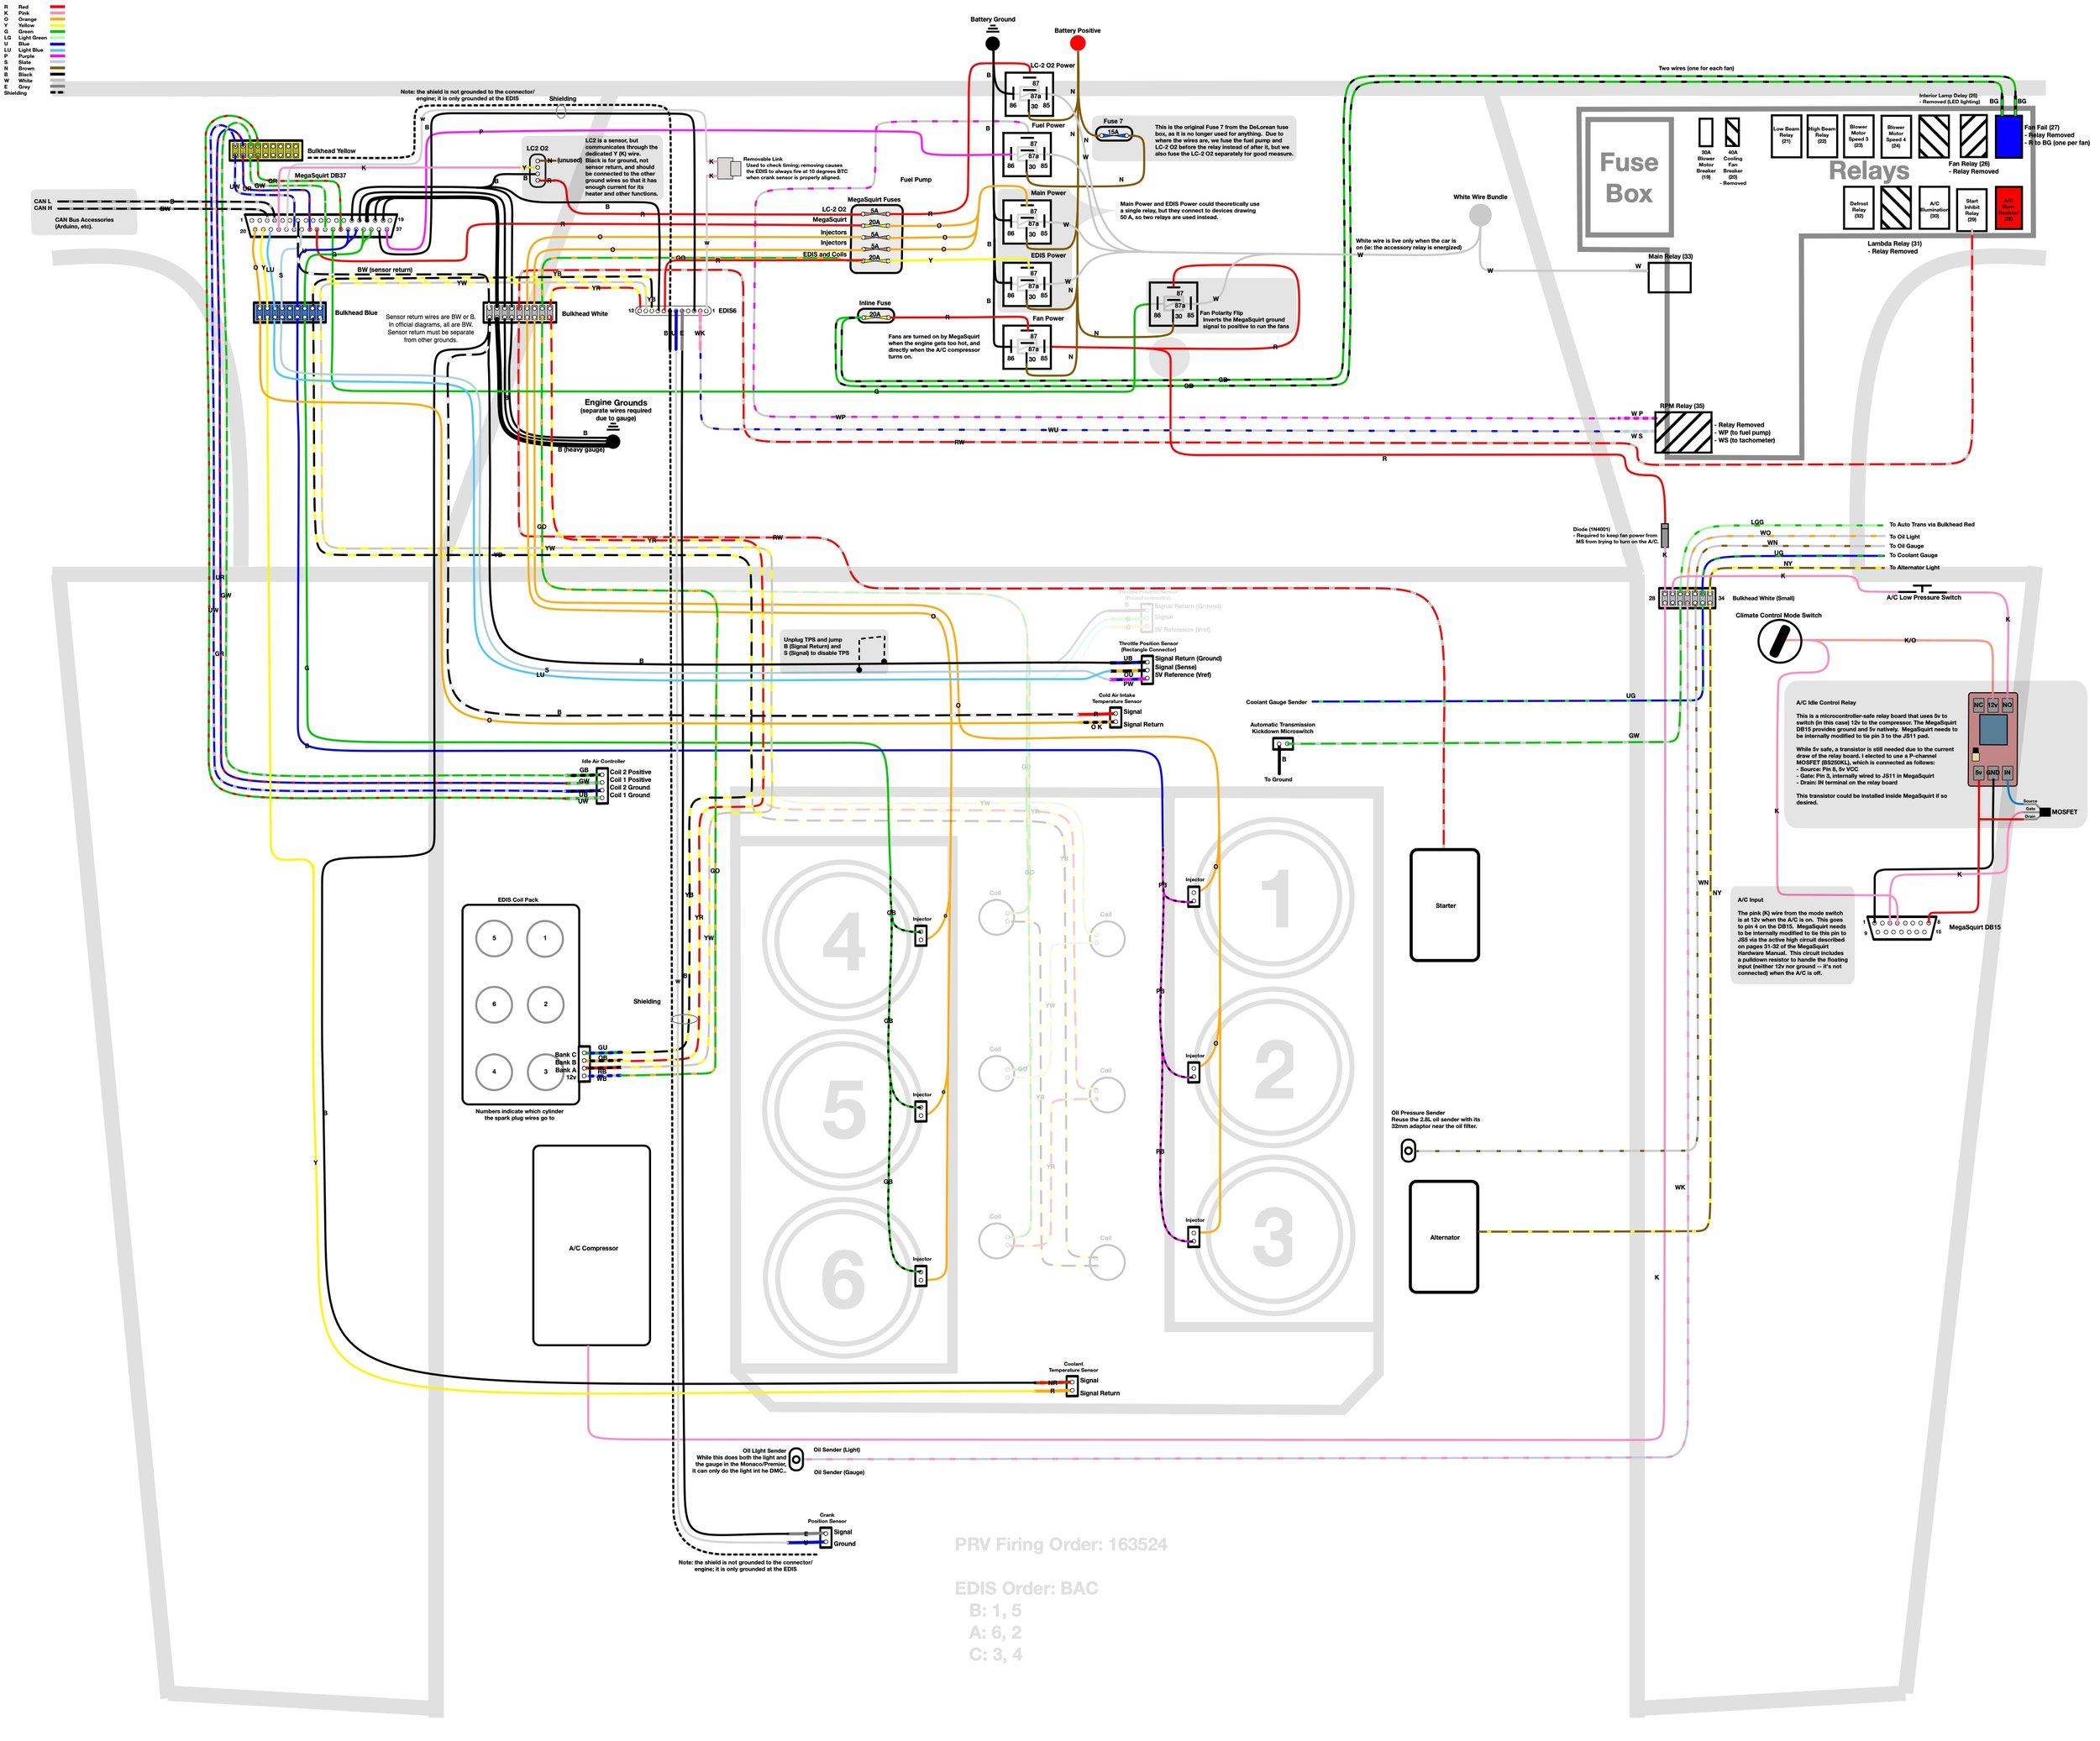 wiring installing the new harness and fuel injector refurbishing rh tmproductions com delorean radio wiring diagram Wiring Diagram Symbols